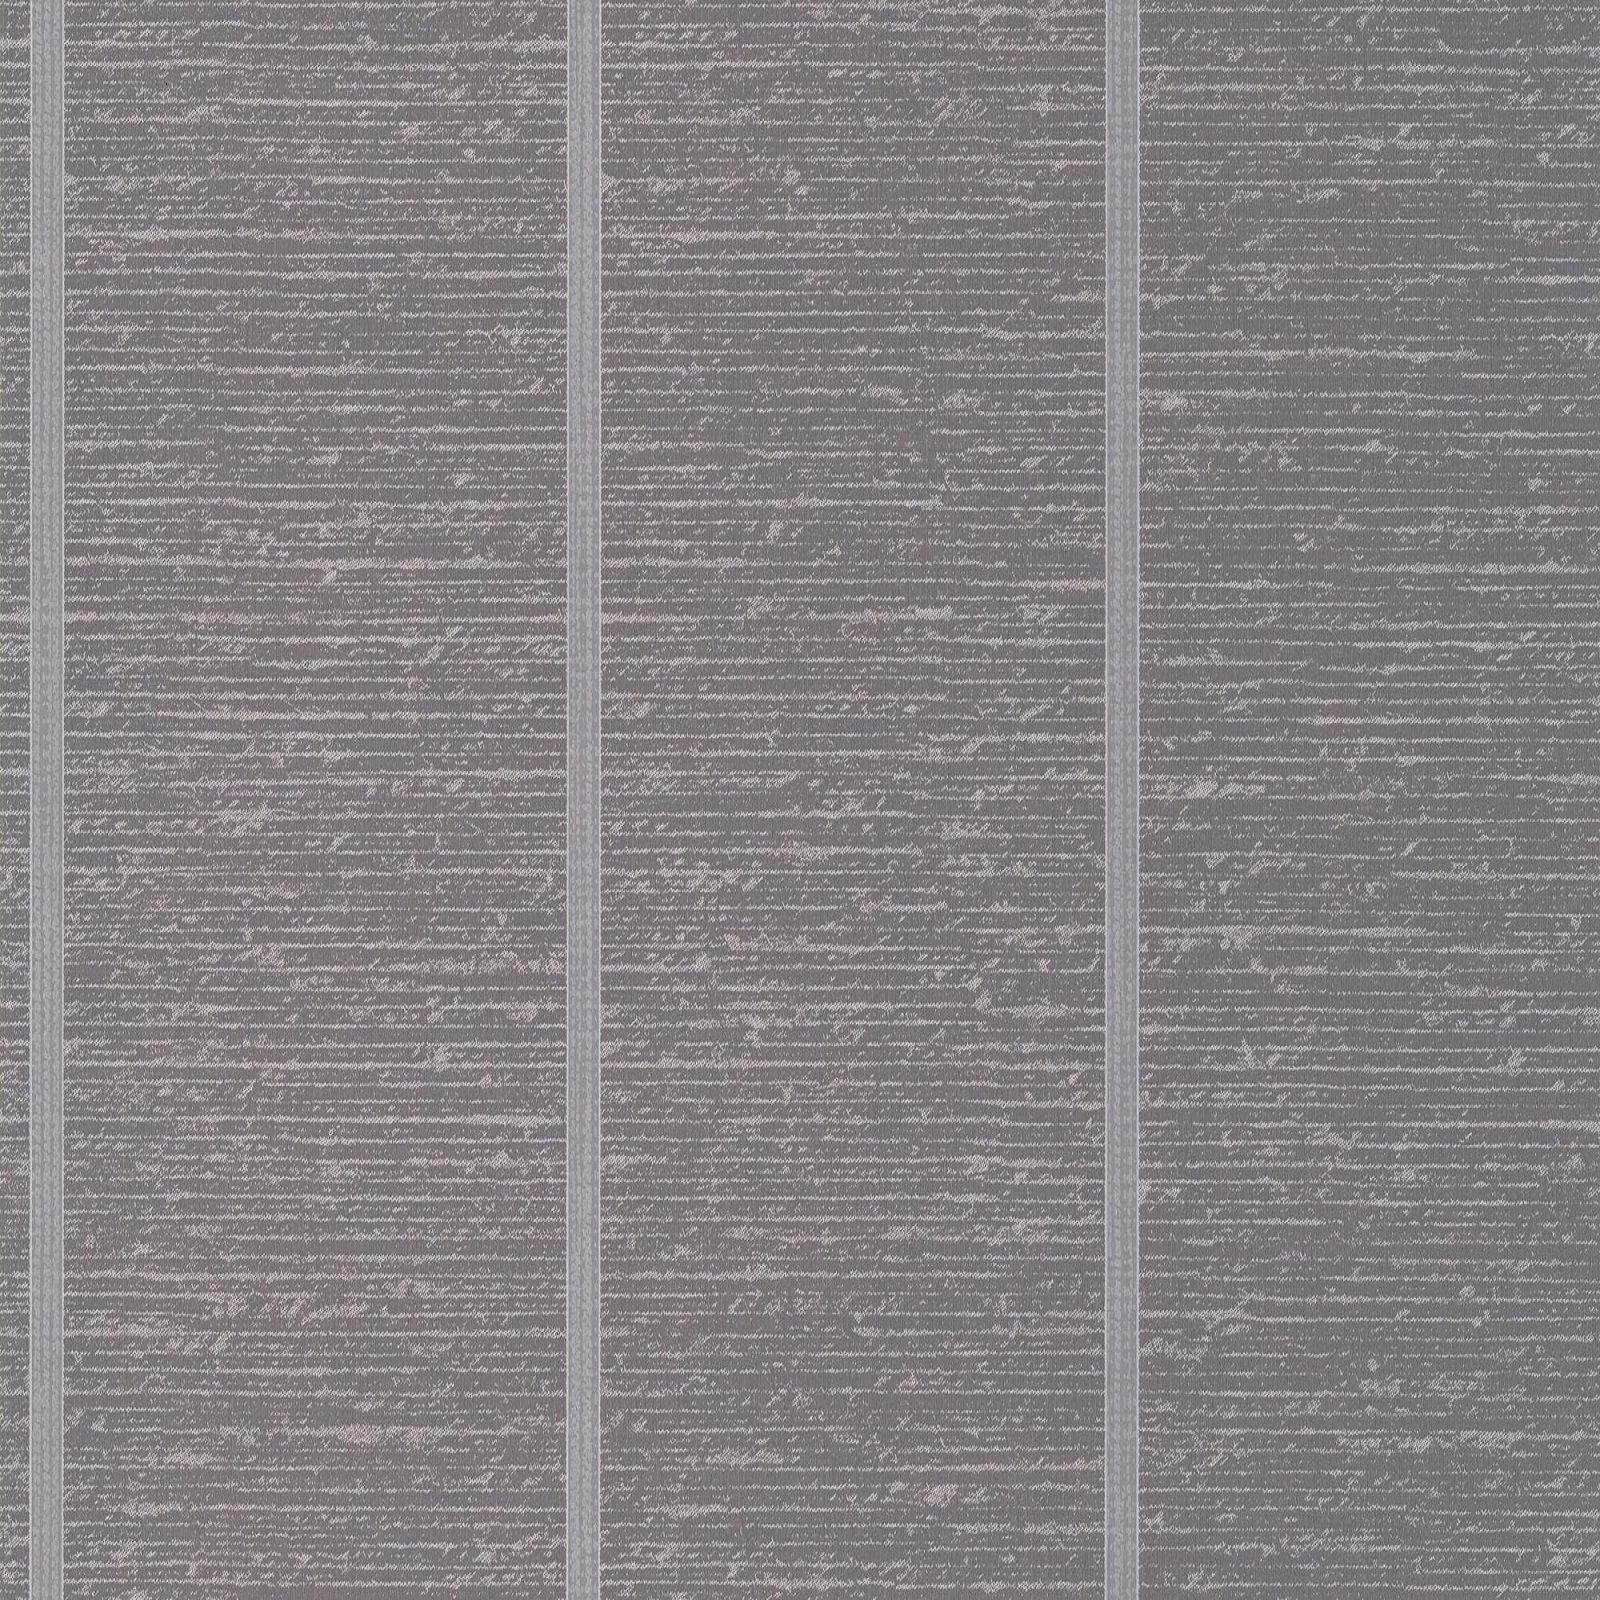 Graham & Brown 52cm x 10m Charcoal Prarie Wallpaper